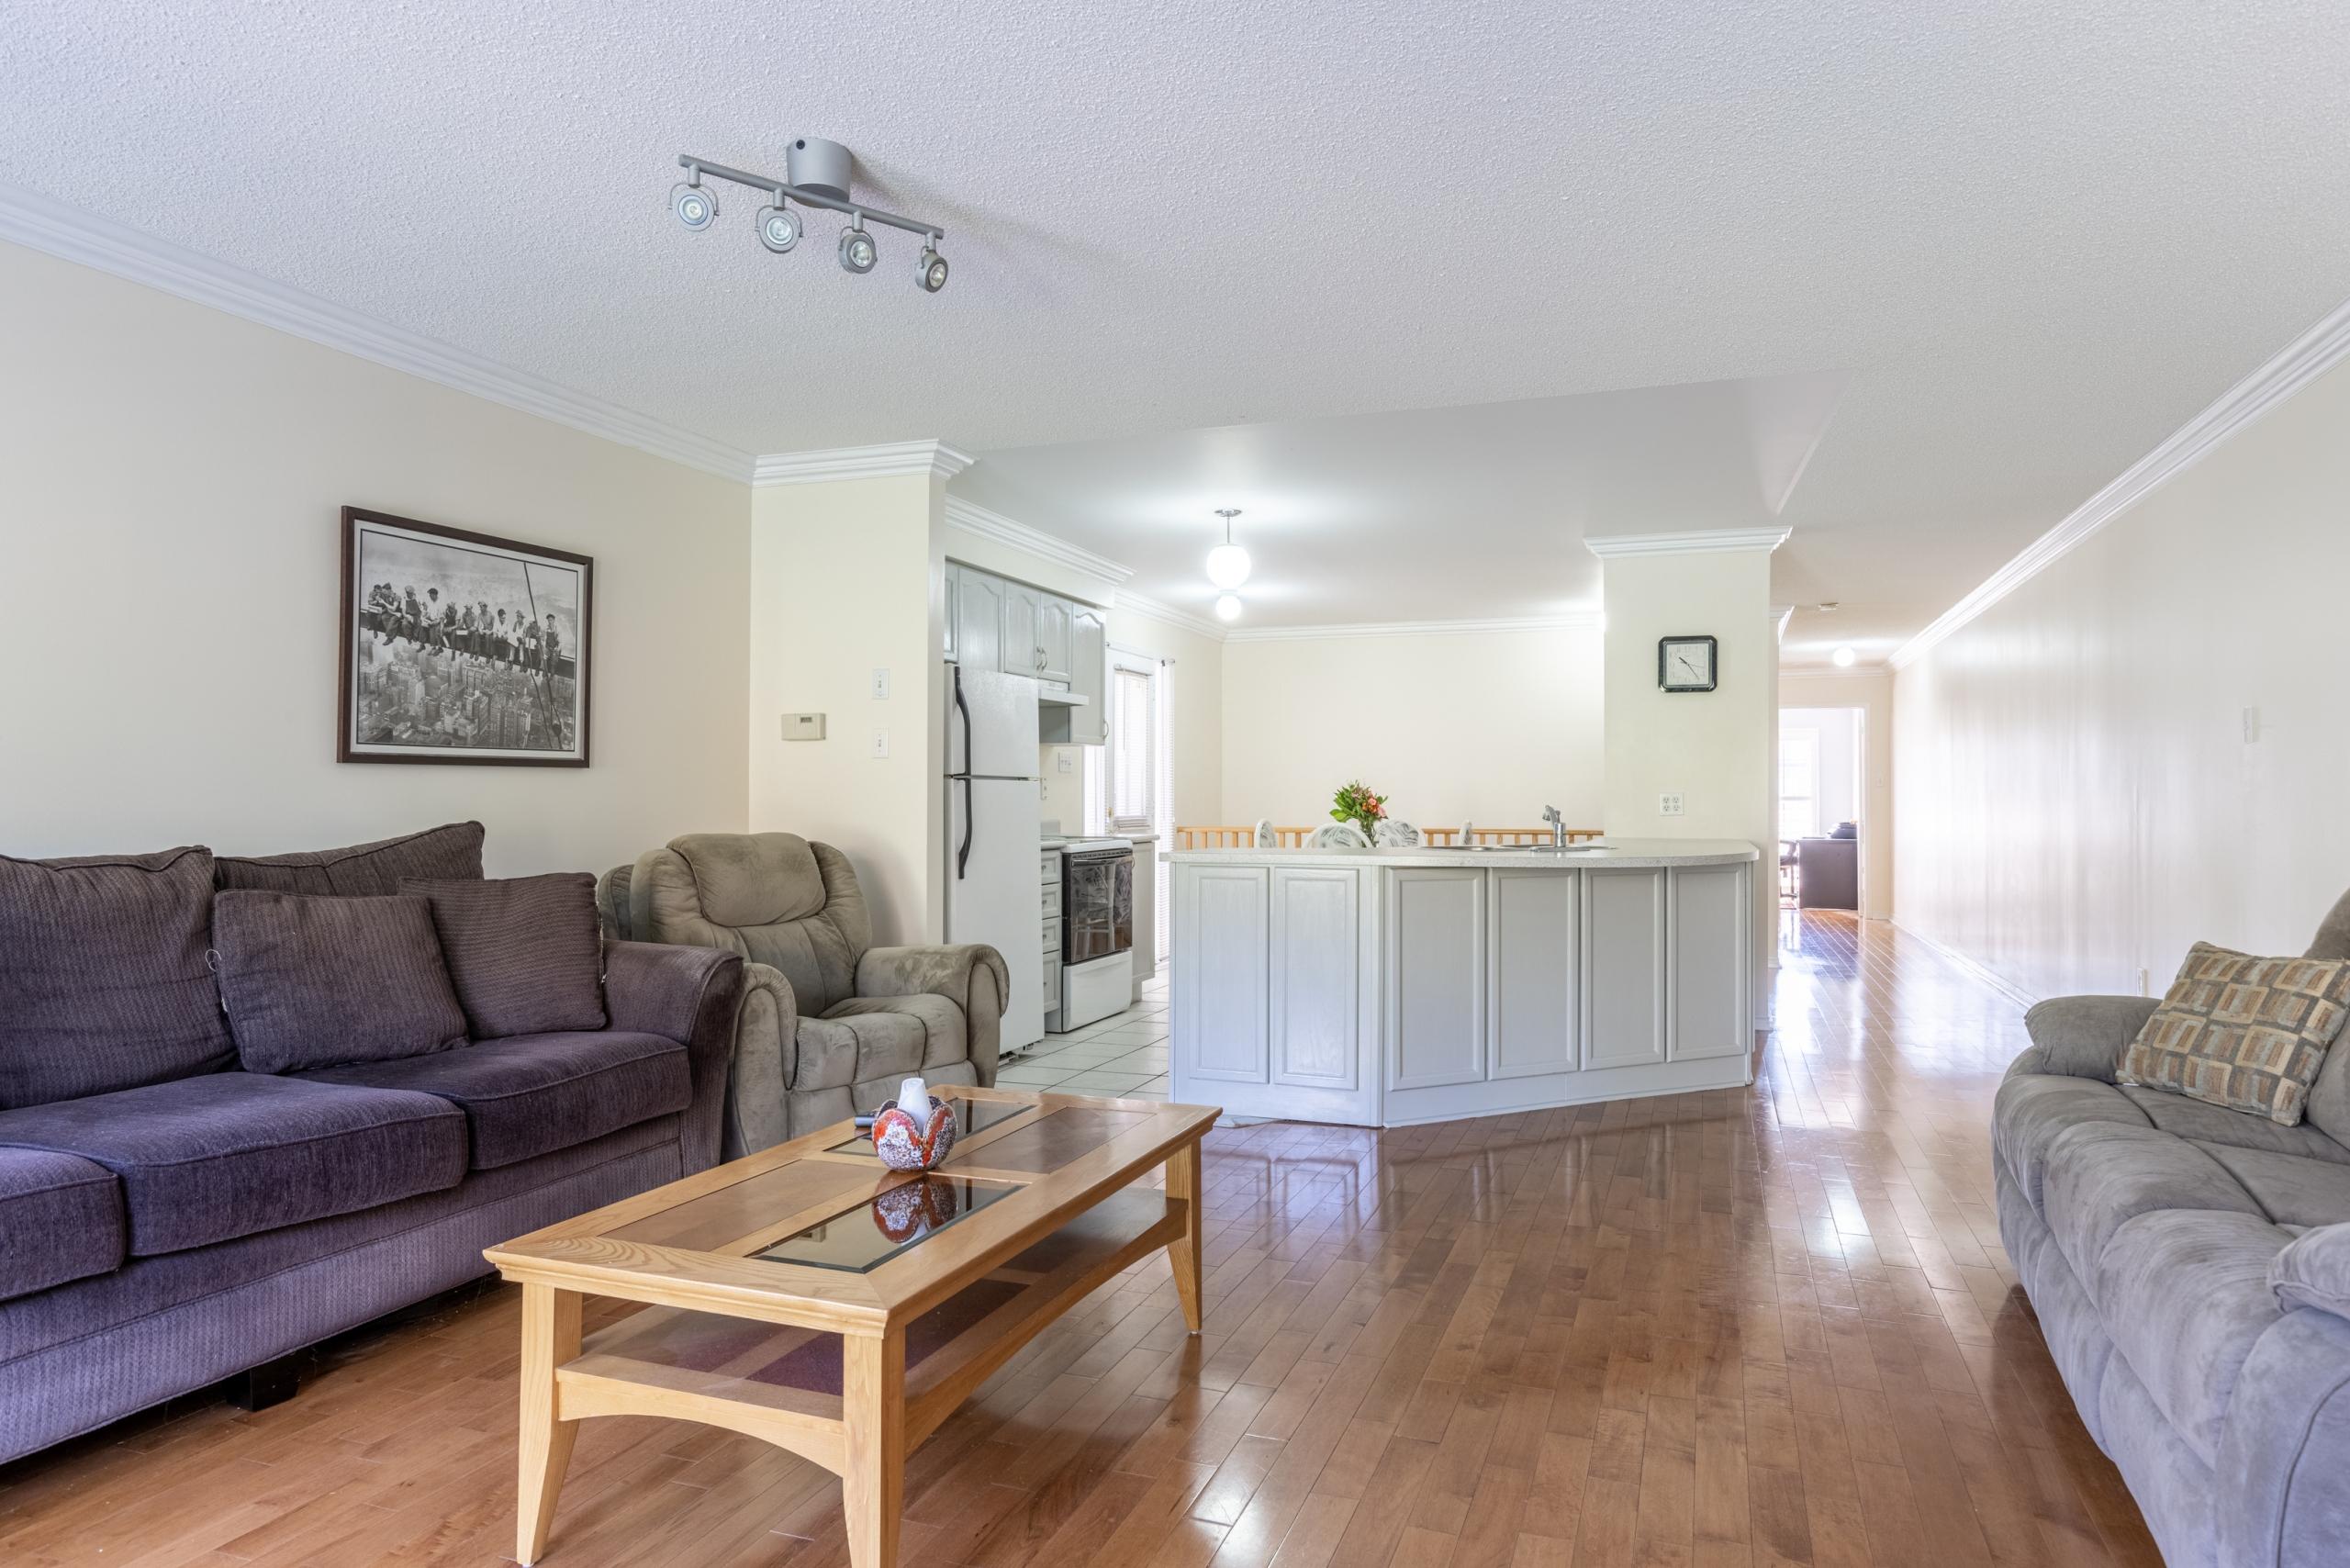 Living room featured at 343 Wildgrass Road, Mississauga, ON at Alex Irish & Associates